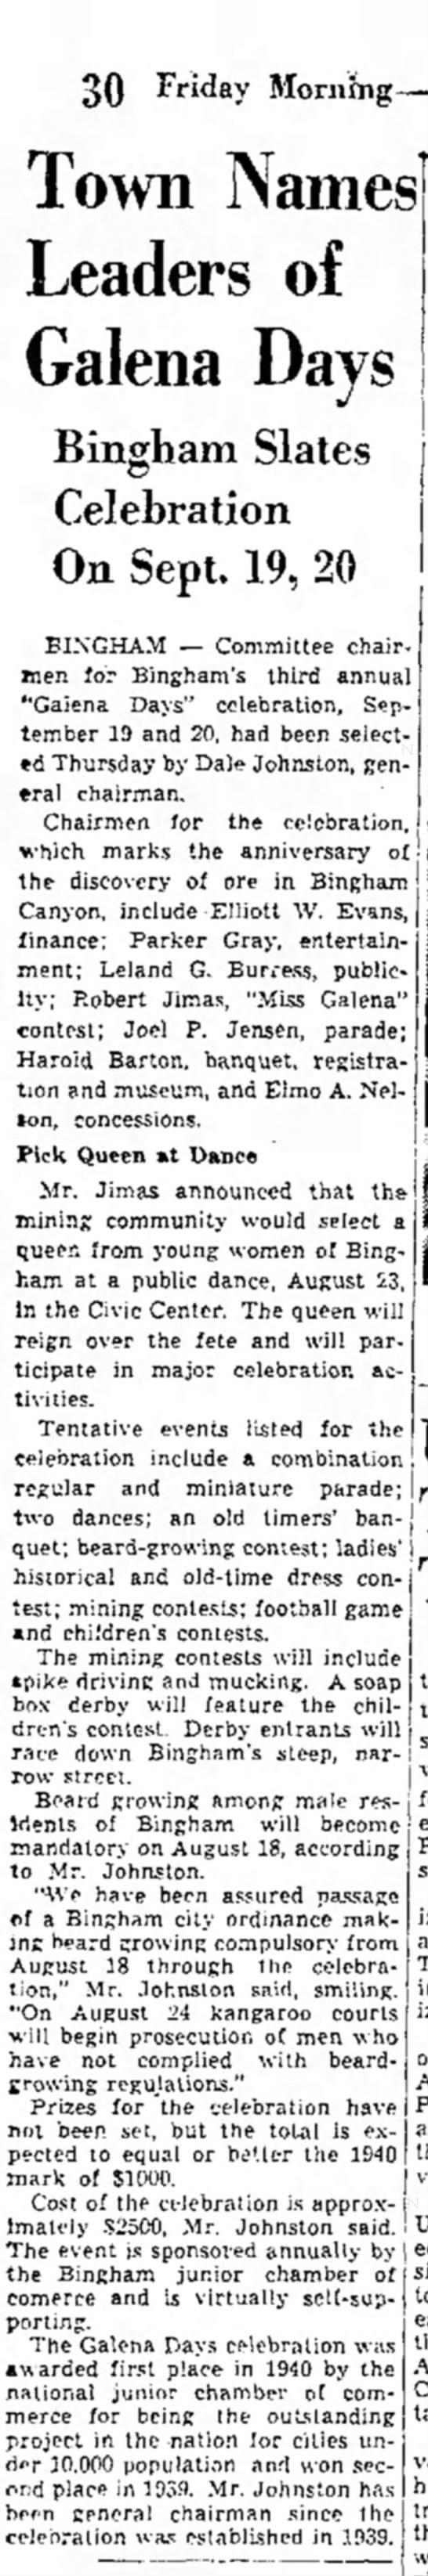 1941 Galena Days selects chairman, Dale Johnston - 30 Friday Mornhig- Galena Days Bingham Slates...